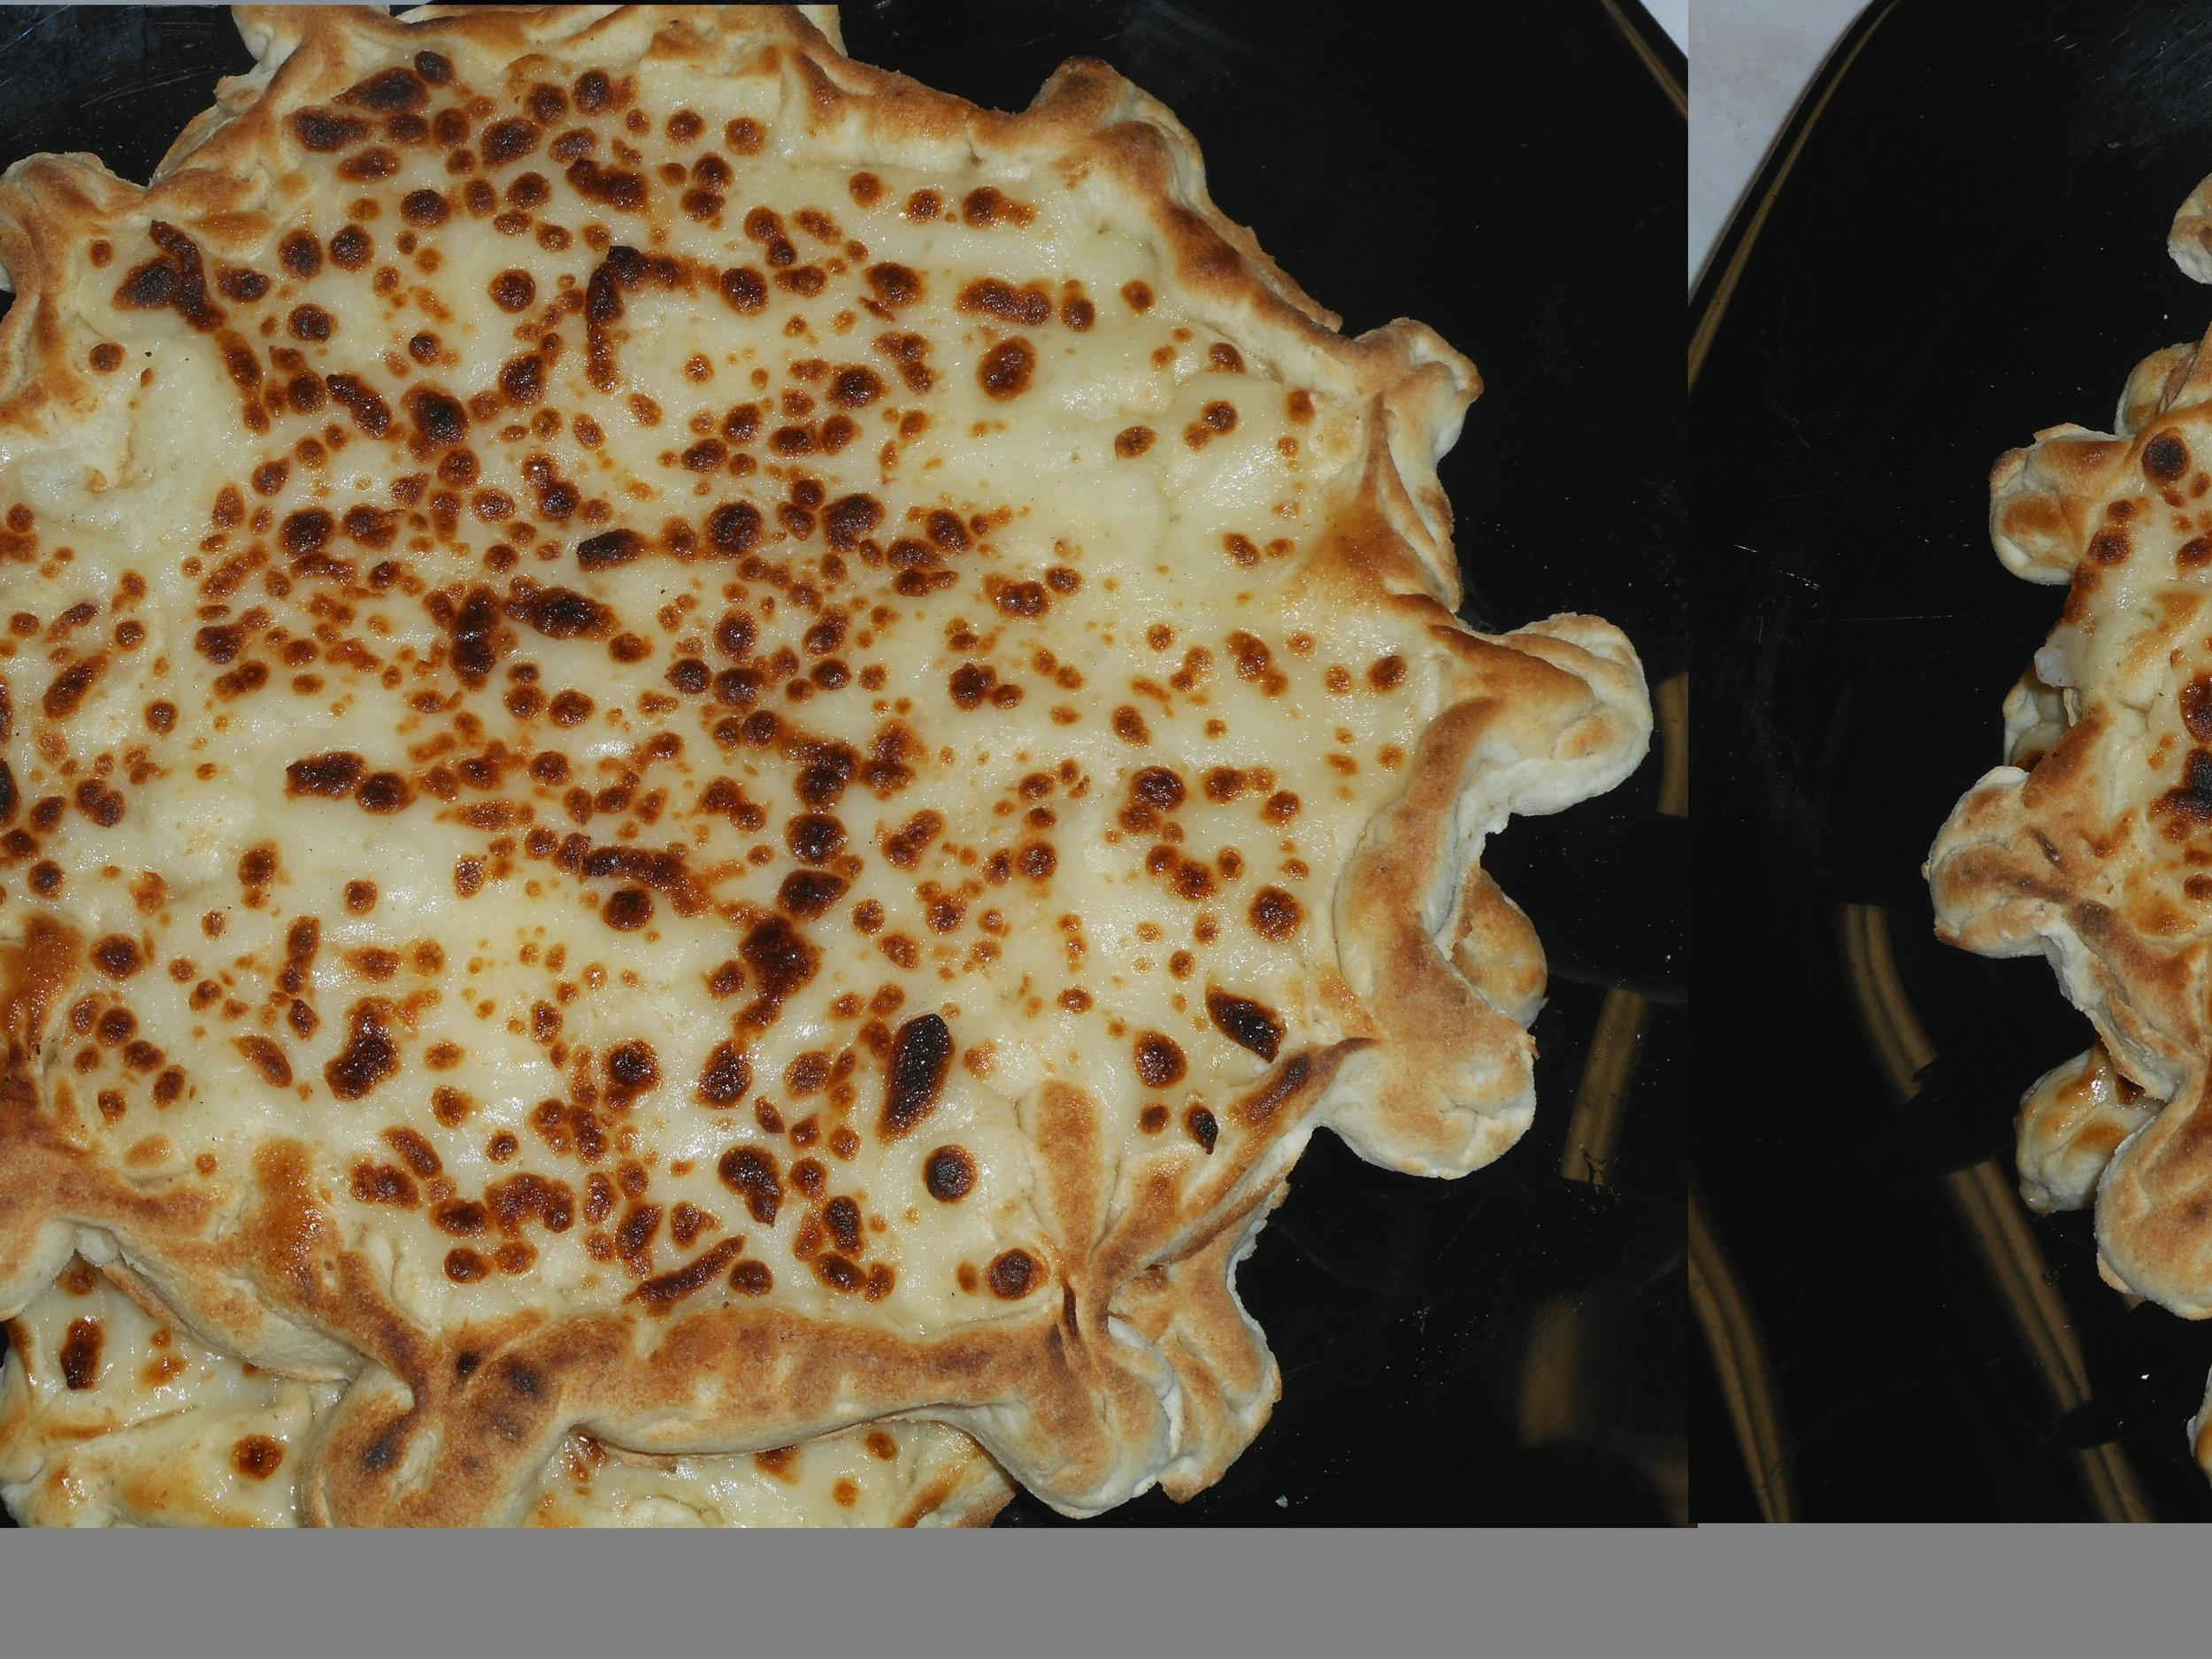 Cheesy-Zatar-Bread-Pak-Halal-Mediterranean- Grocery-Store-12259-W-87th-St-Pkwy-Lenexa-KS-66215.JPG